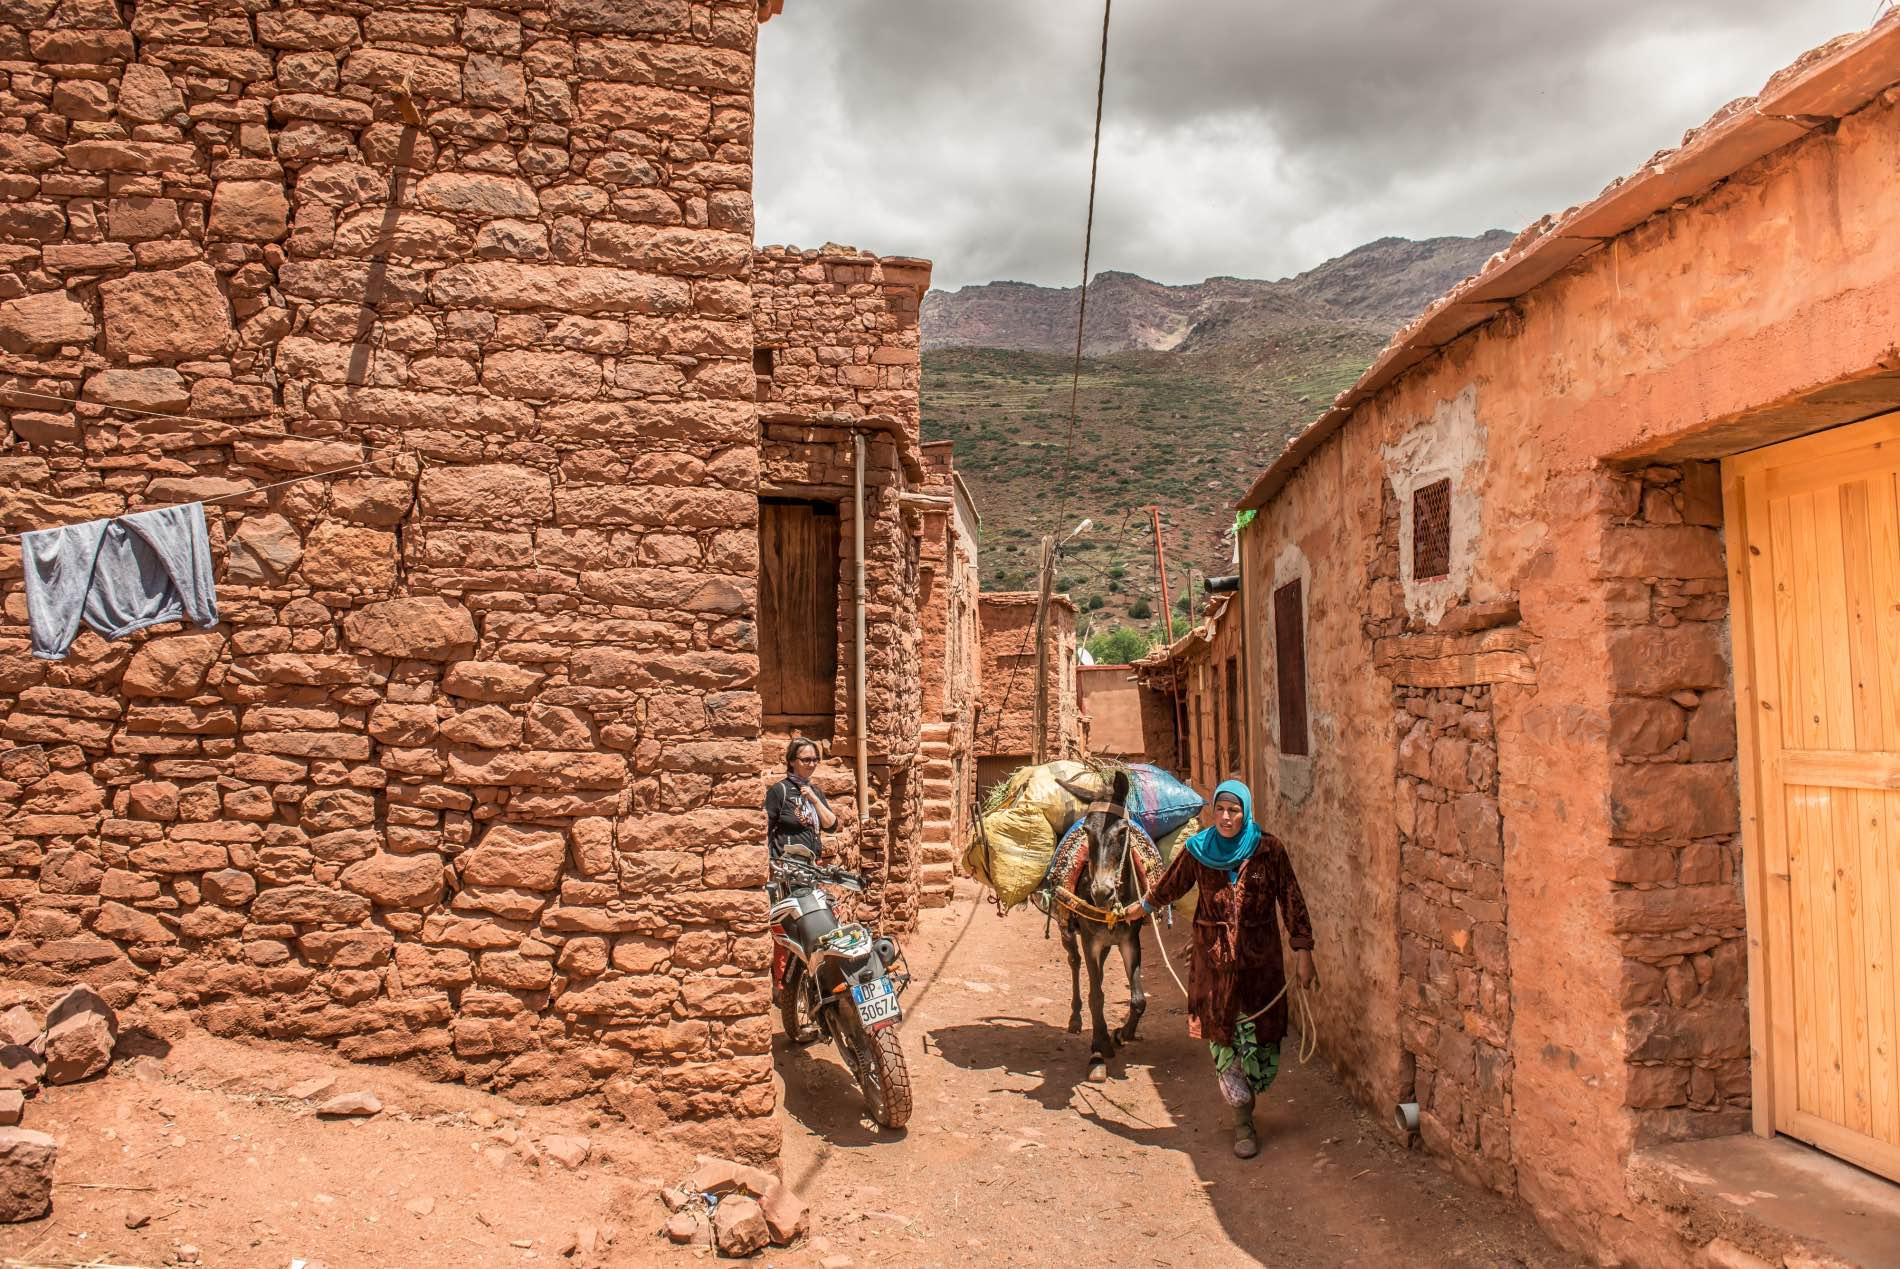 Marocco-viaggio-camper-camion-4x4